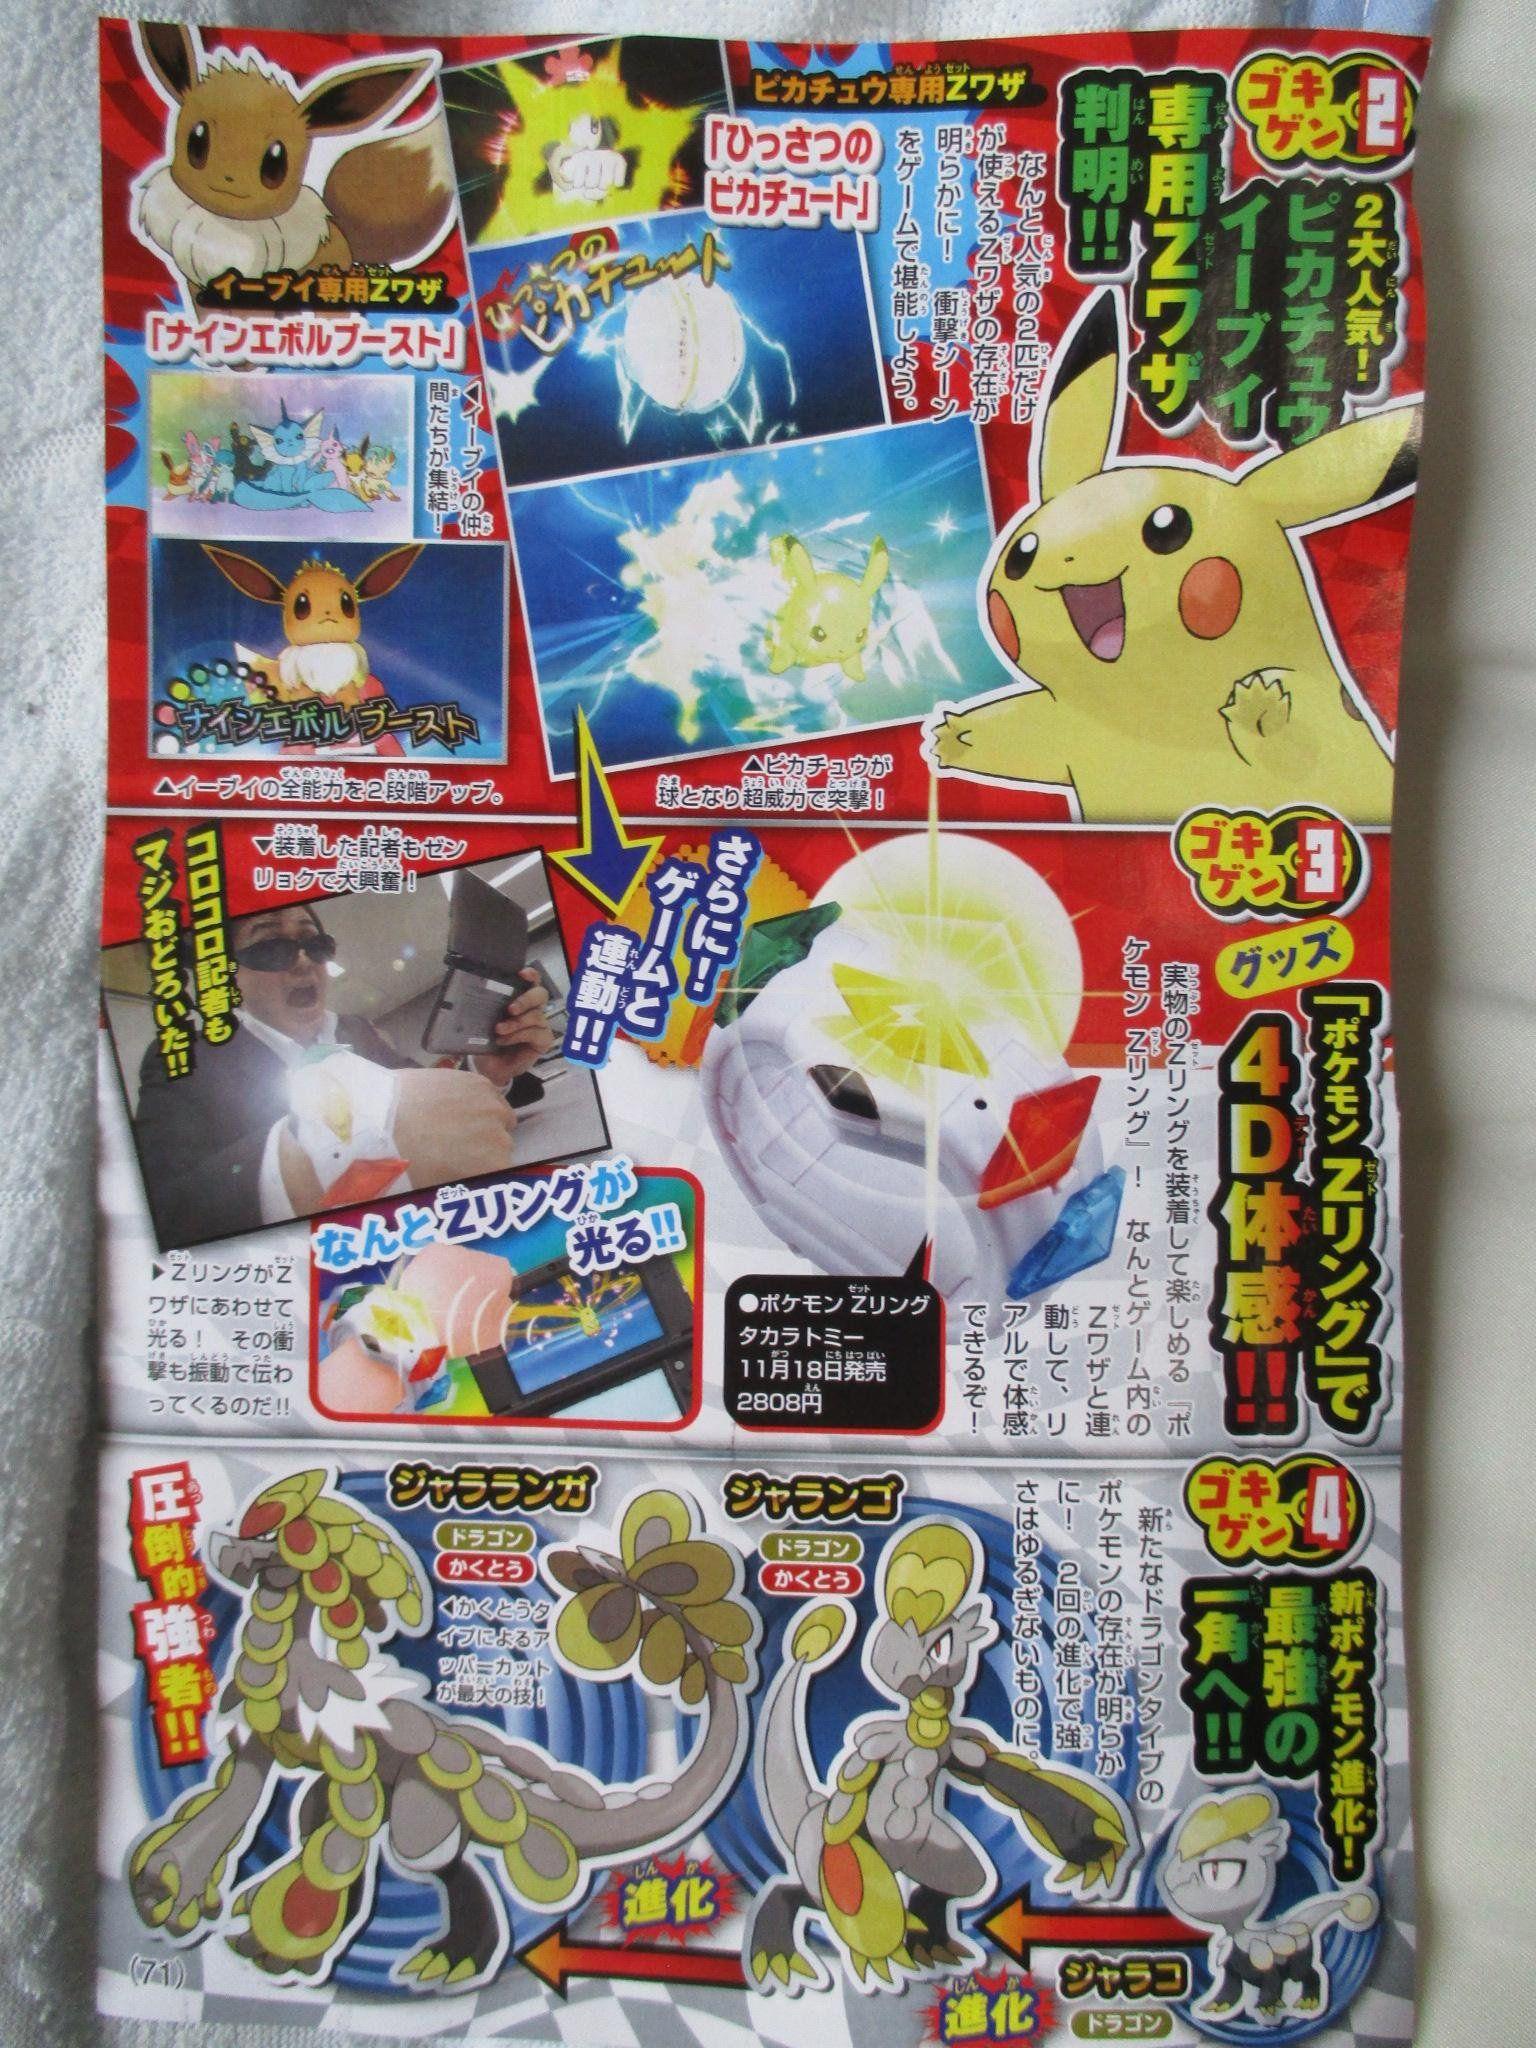 Serebii net - Where Legends Come To Life | Pokémon | Pokemon